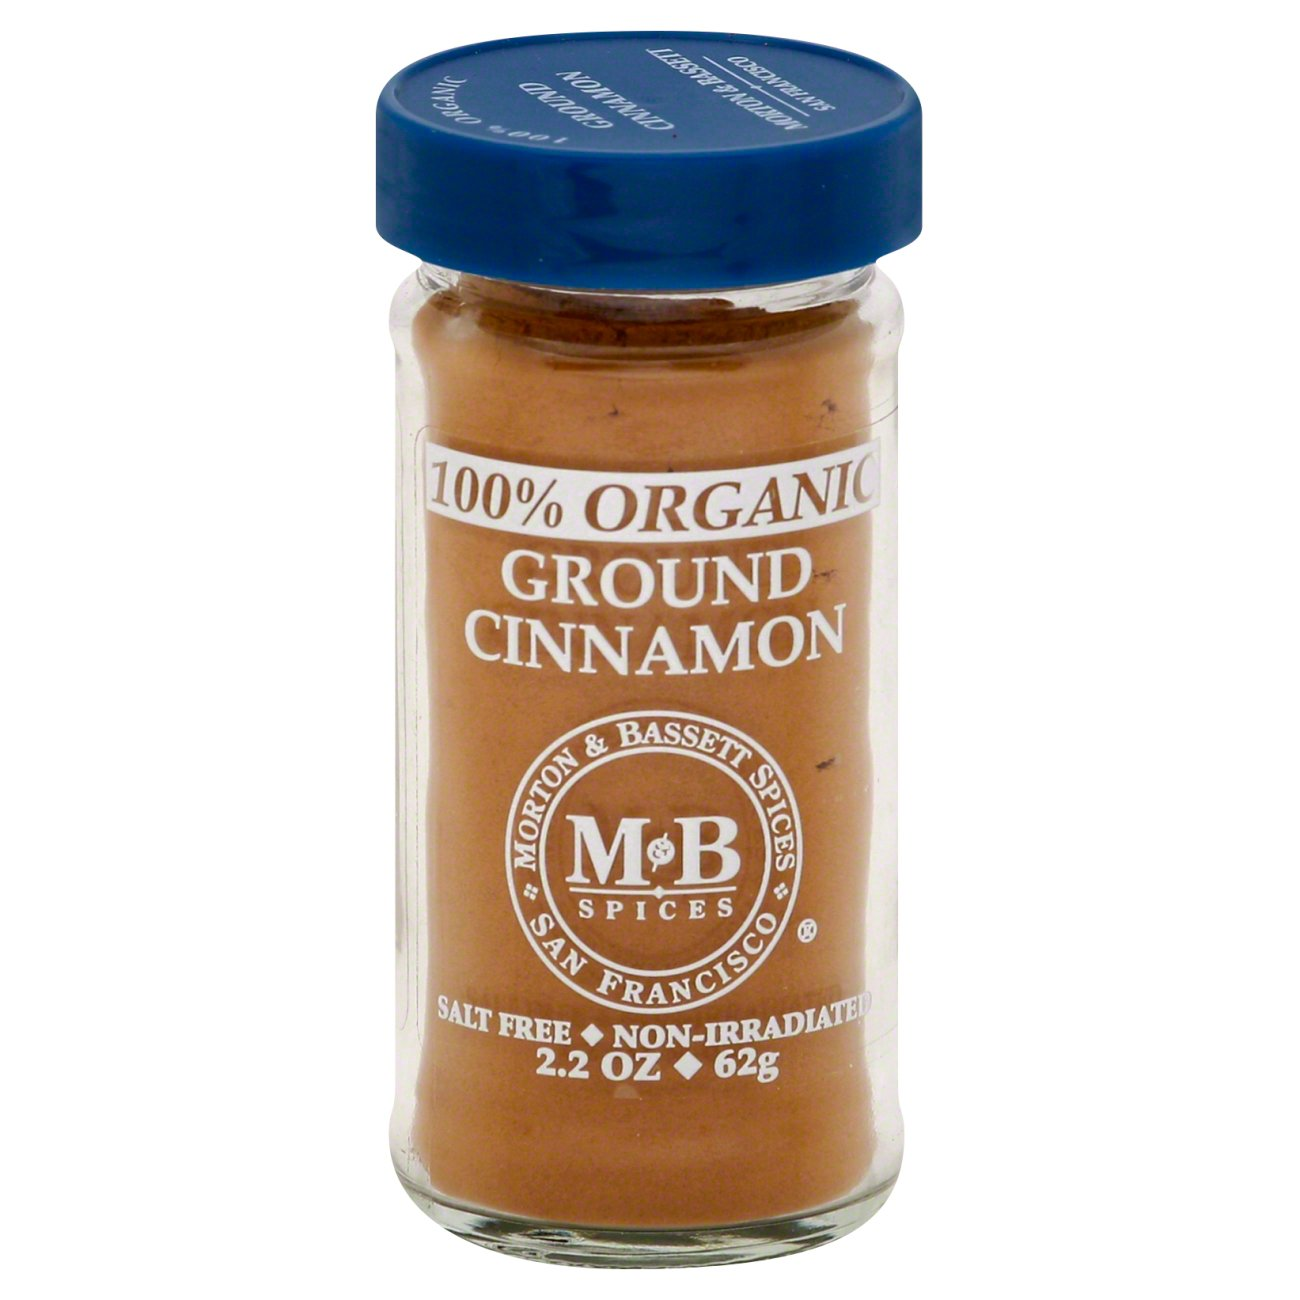 Morton & Bassett 100% Organic Ground